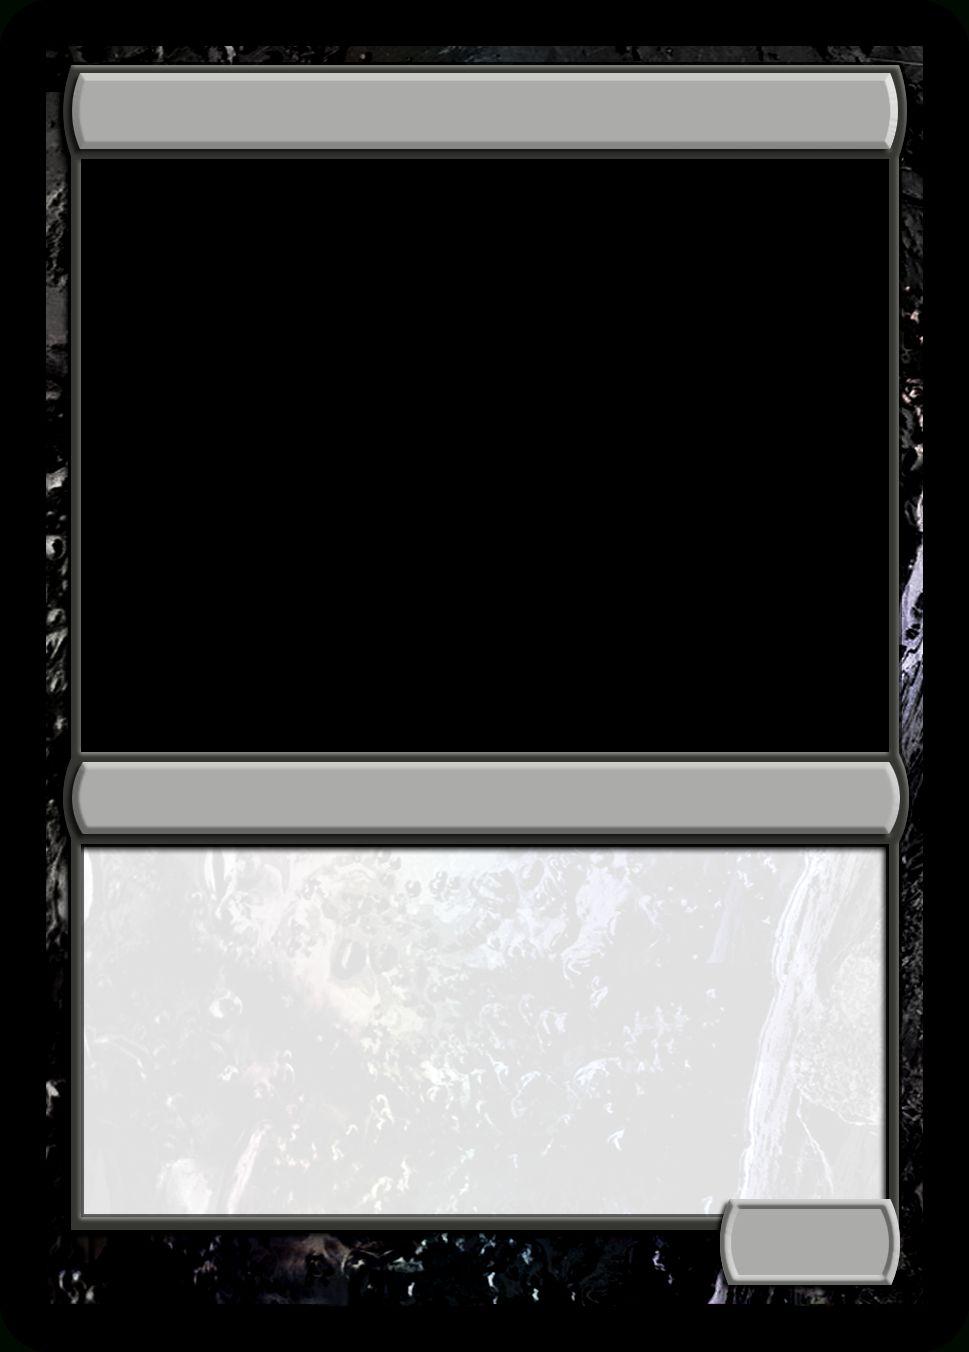 The Stunning Mtg Monoblack Creature Template Mtg Magic The Gathering For Mtg Card Magic The Gathering Cards Magic The Gathering Free Business Card Templates